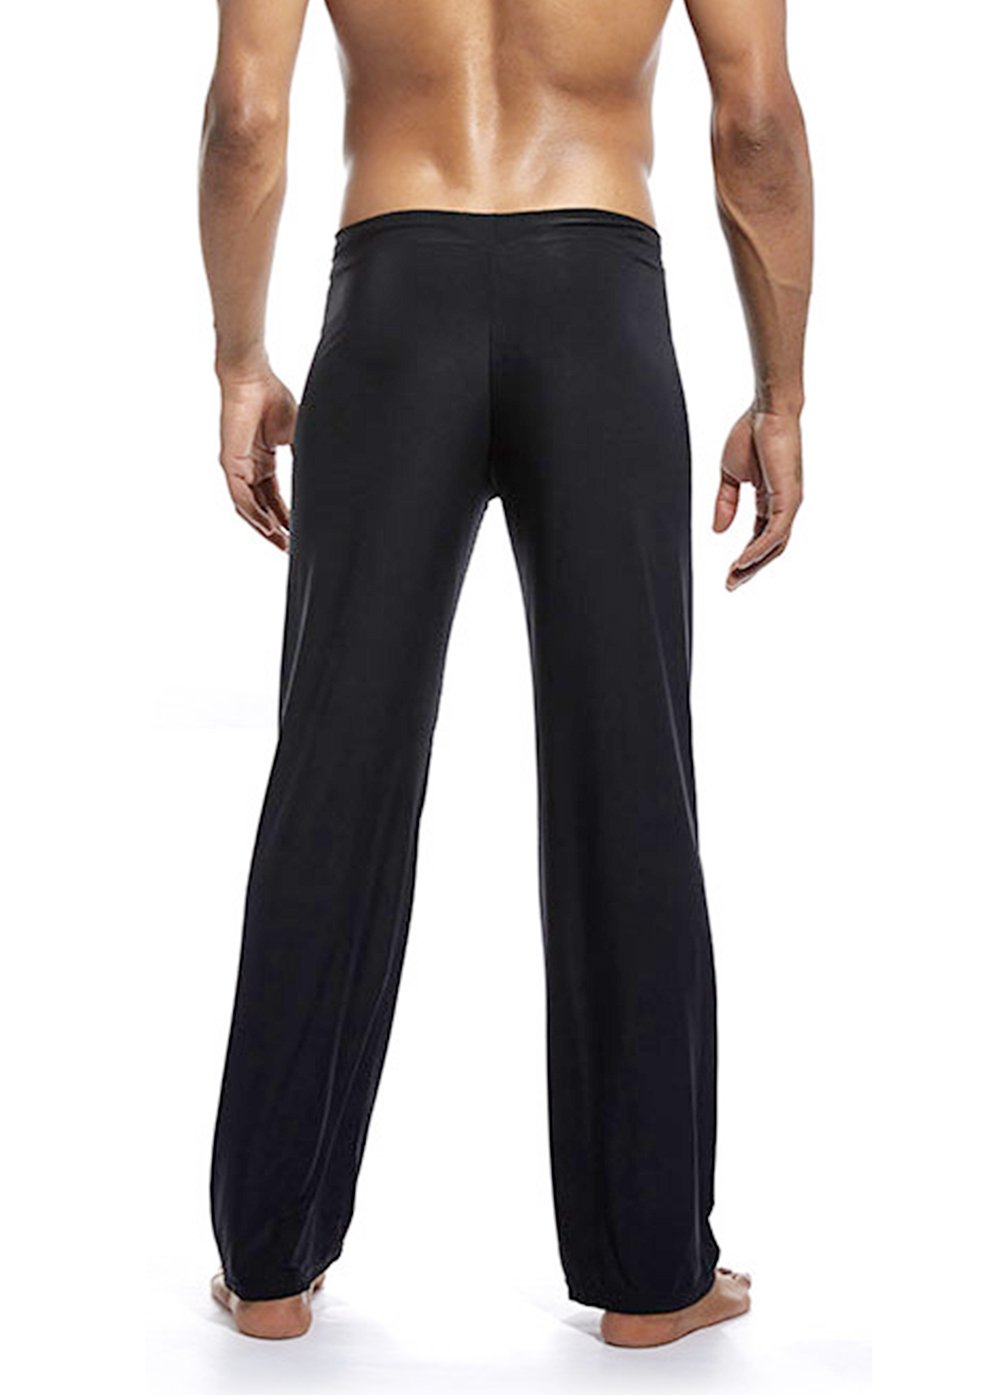 Nylon Yoga Pants Men Straight Fitness Breathable Yoga Pants Men's Casual Solid Loose Sweatpants Trousers Jogger Pant